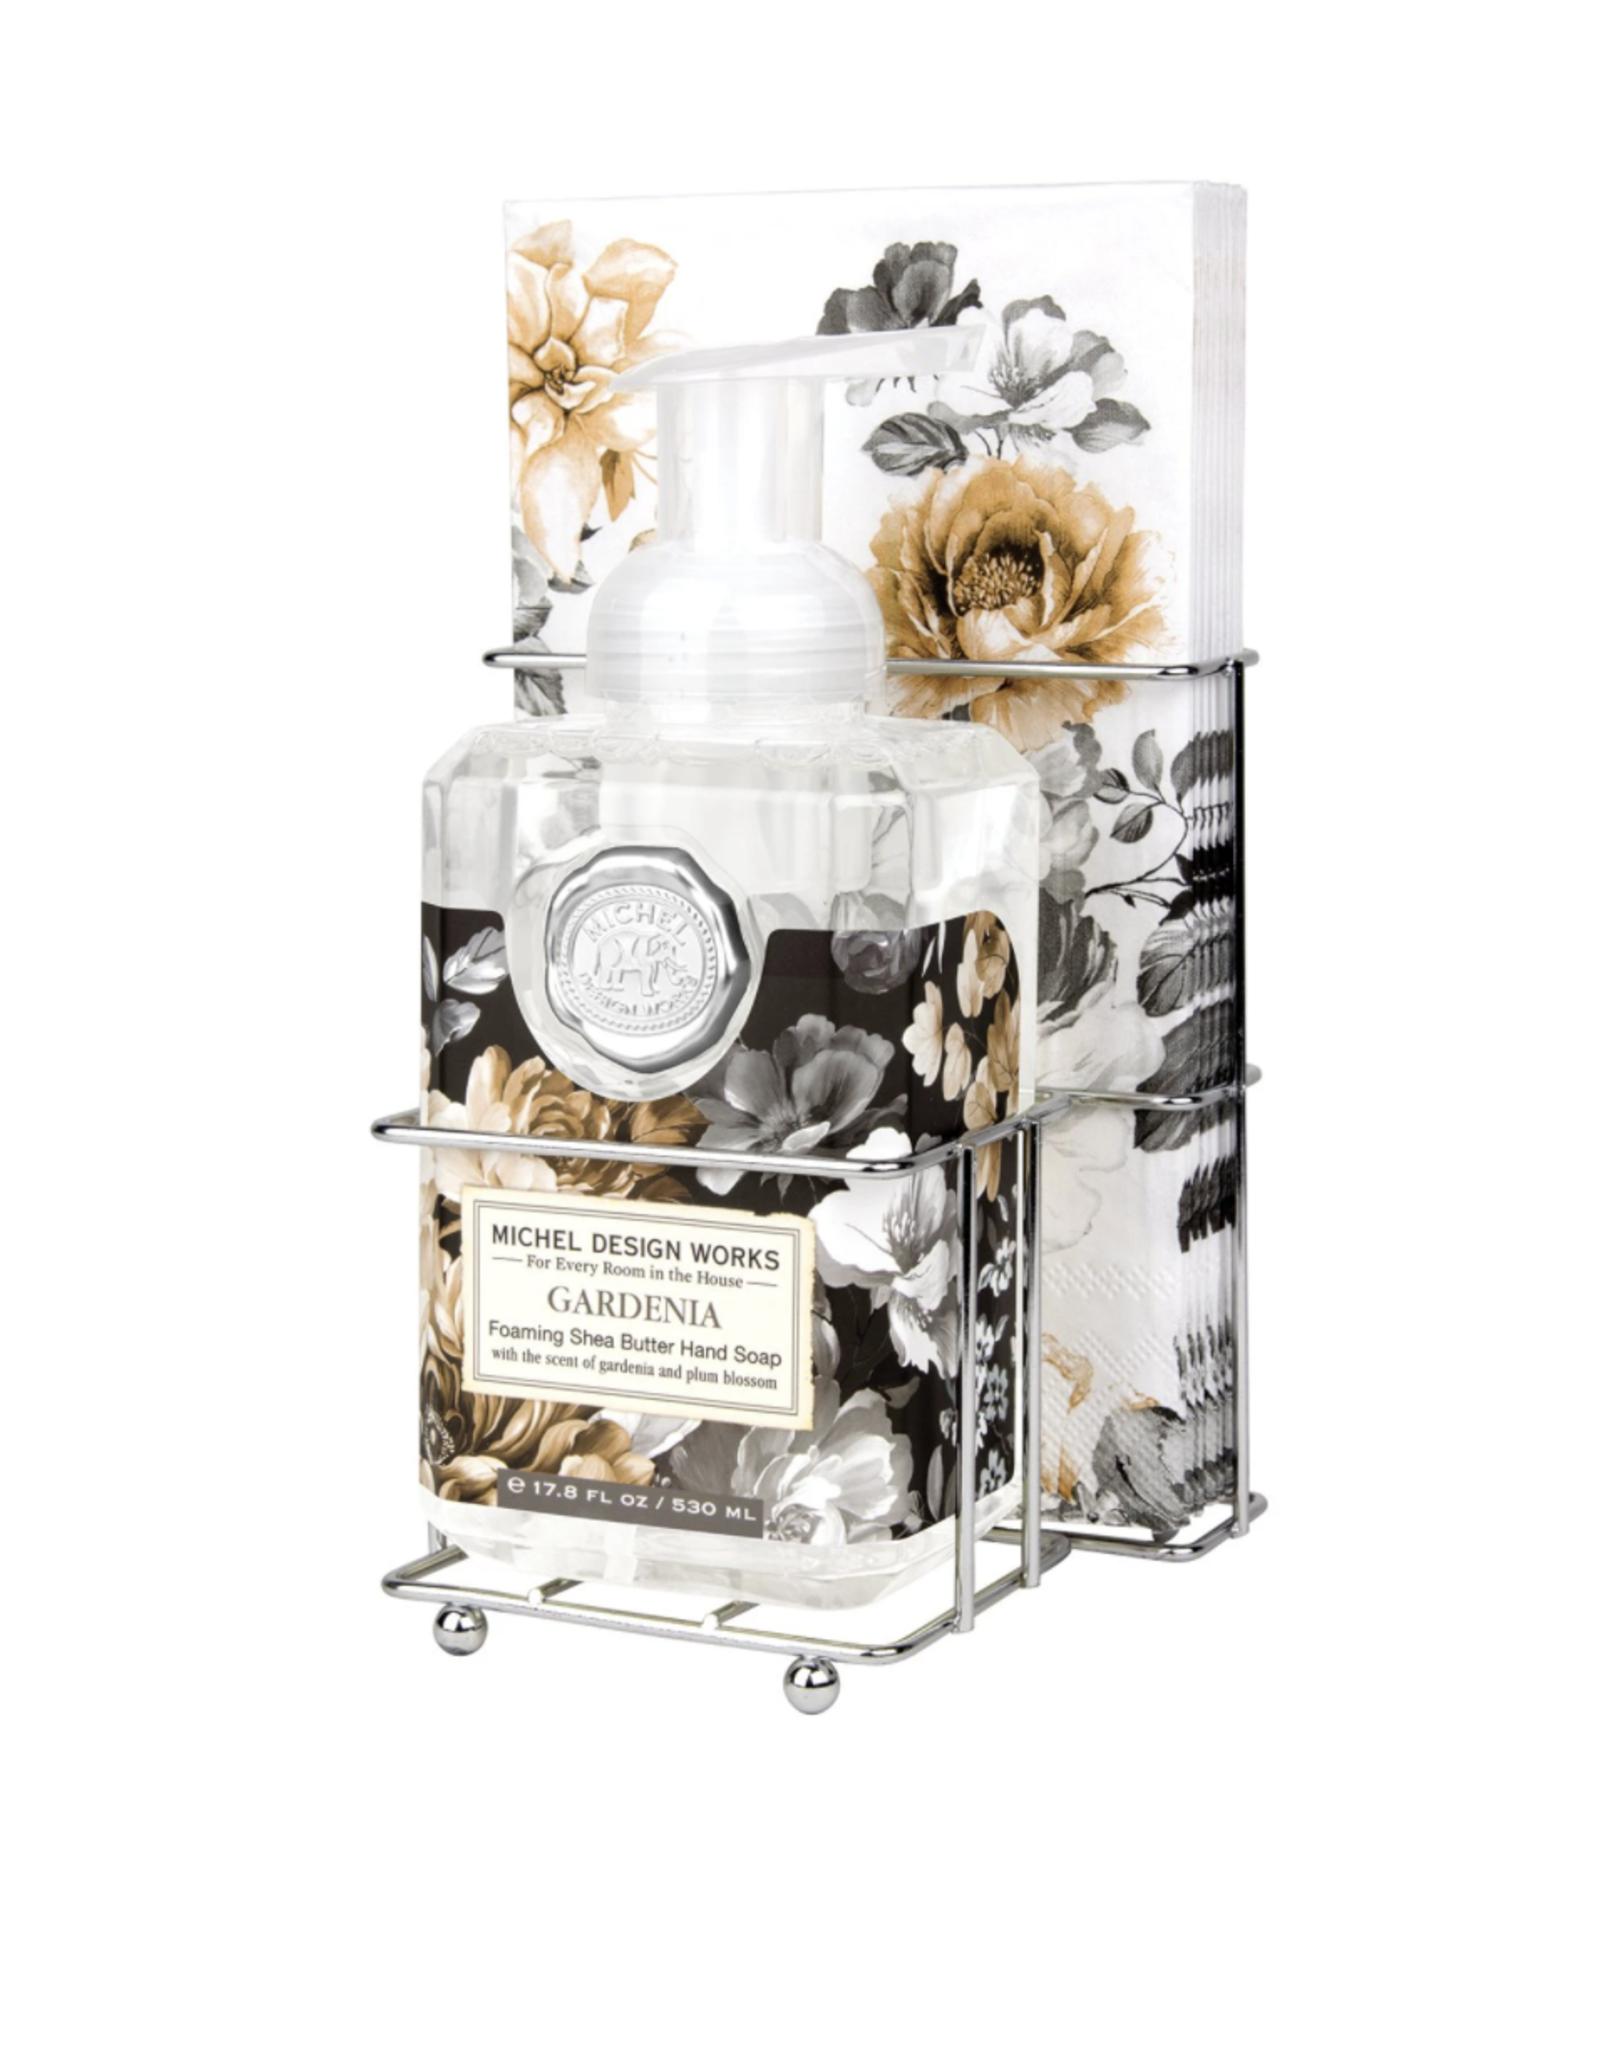 Michel Design Works Gardenia foaming soap and napkin set